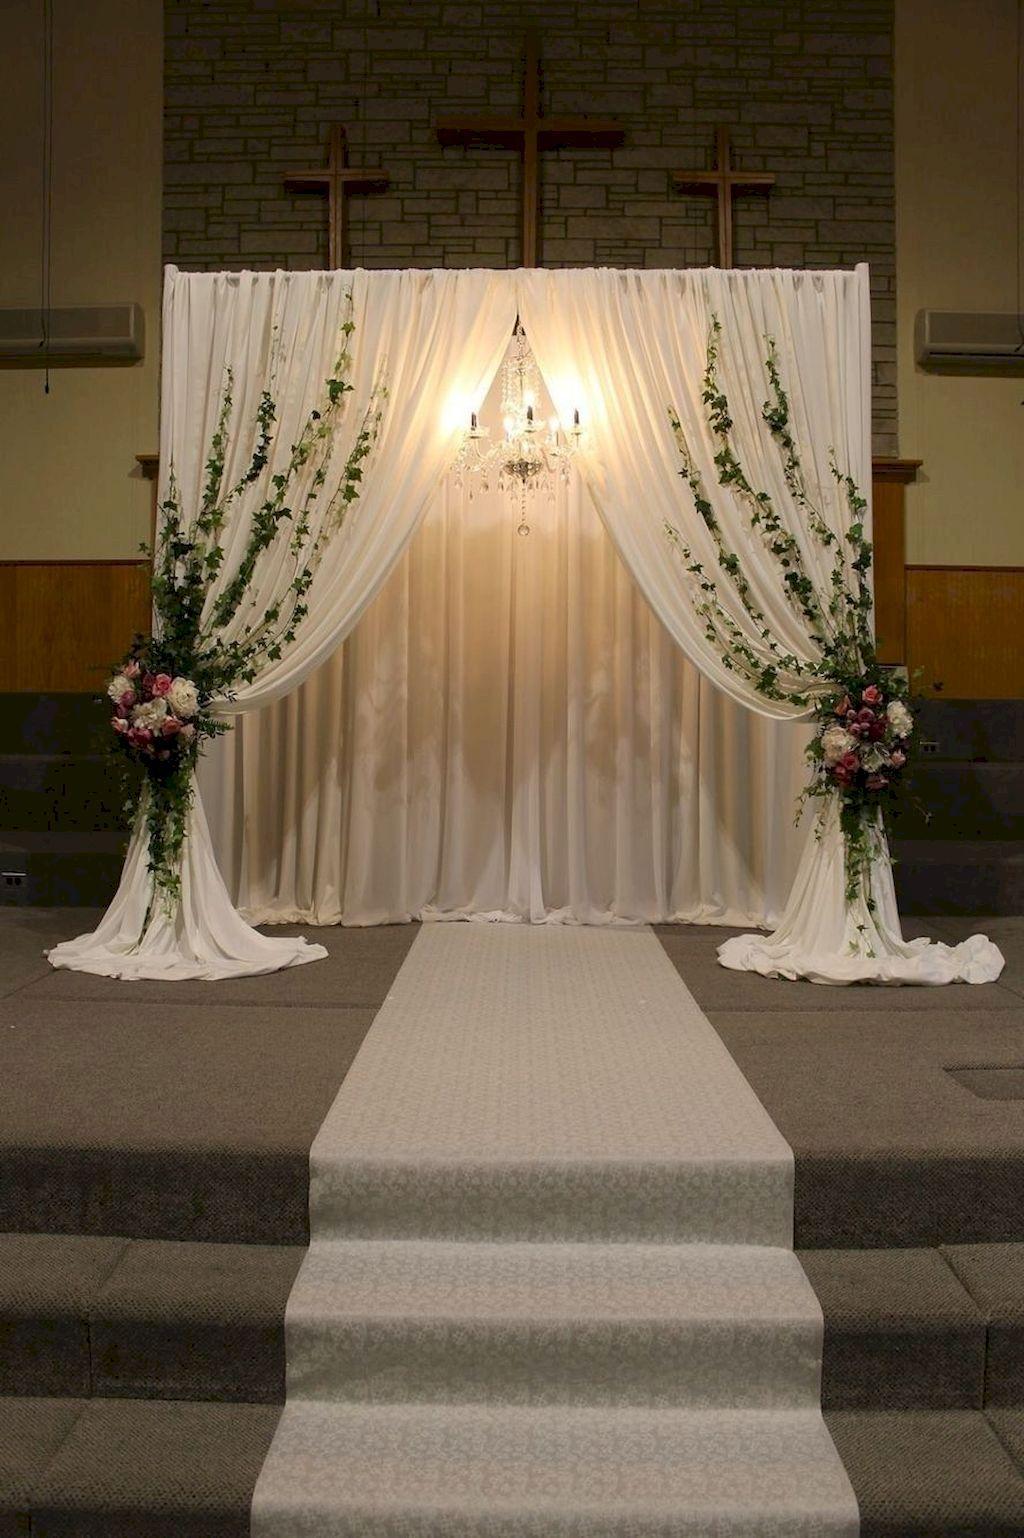 Gorgeous 100+ Amazing Ways for Decorating Wedding Venues ...